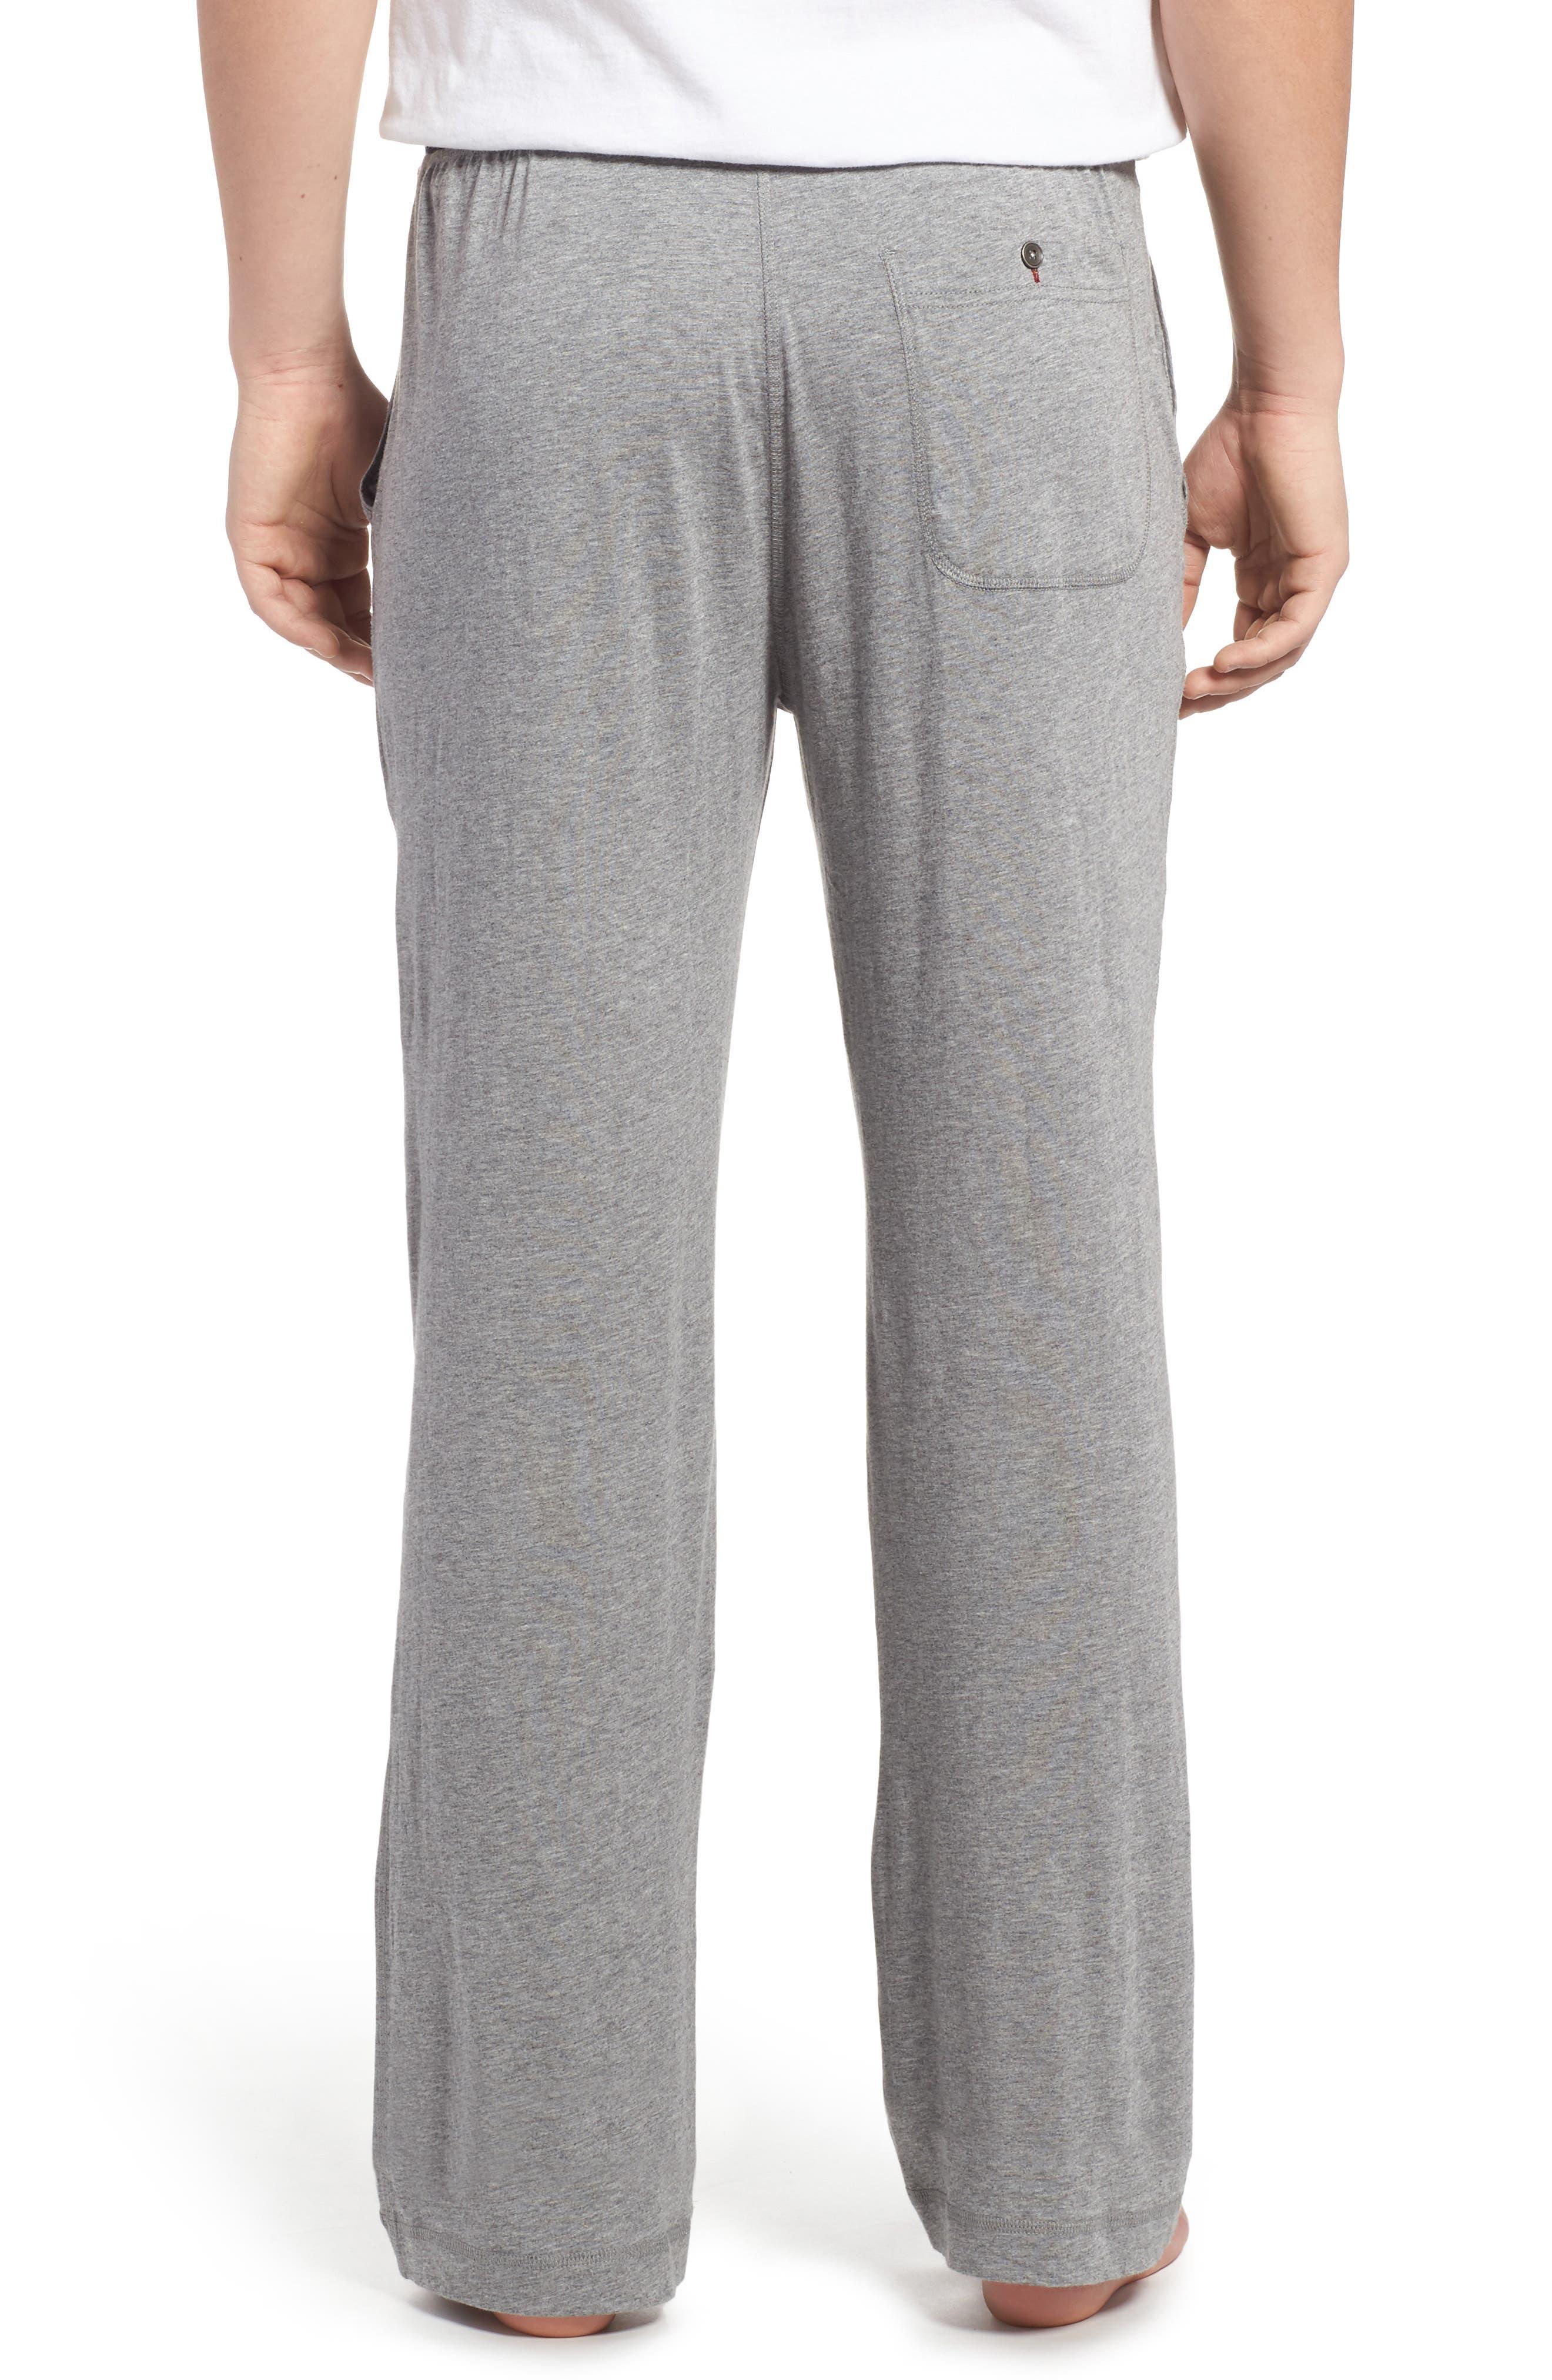 Pima Cotton & Modal Lounge Pants,                             Alternate thumbnail 2, color,                             Grey Heather